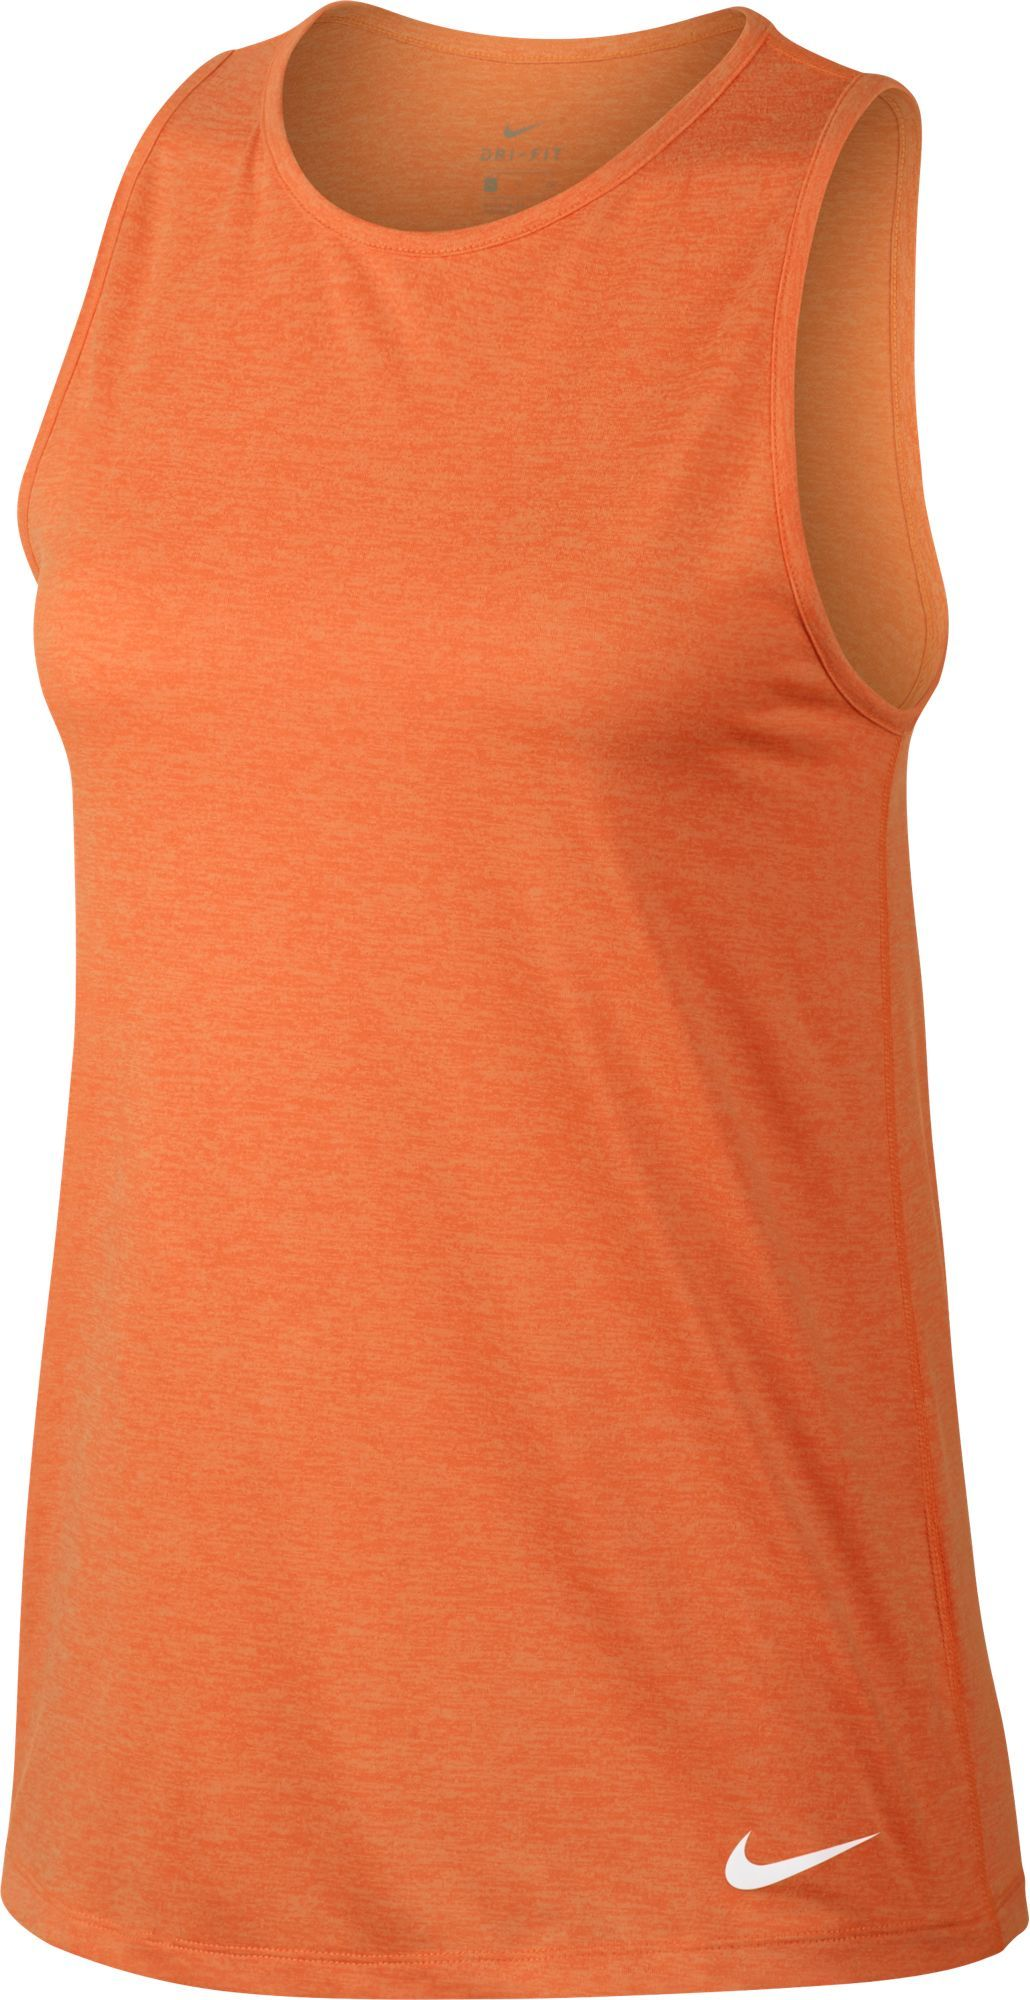 0b5bd1ec Nike Women's Dry Tomboy Cross-Dye Tank Top | Products | Nike women ...